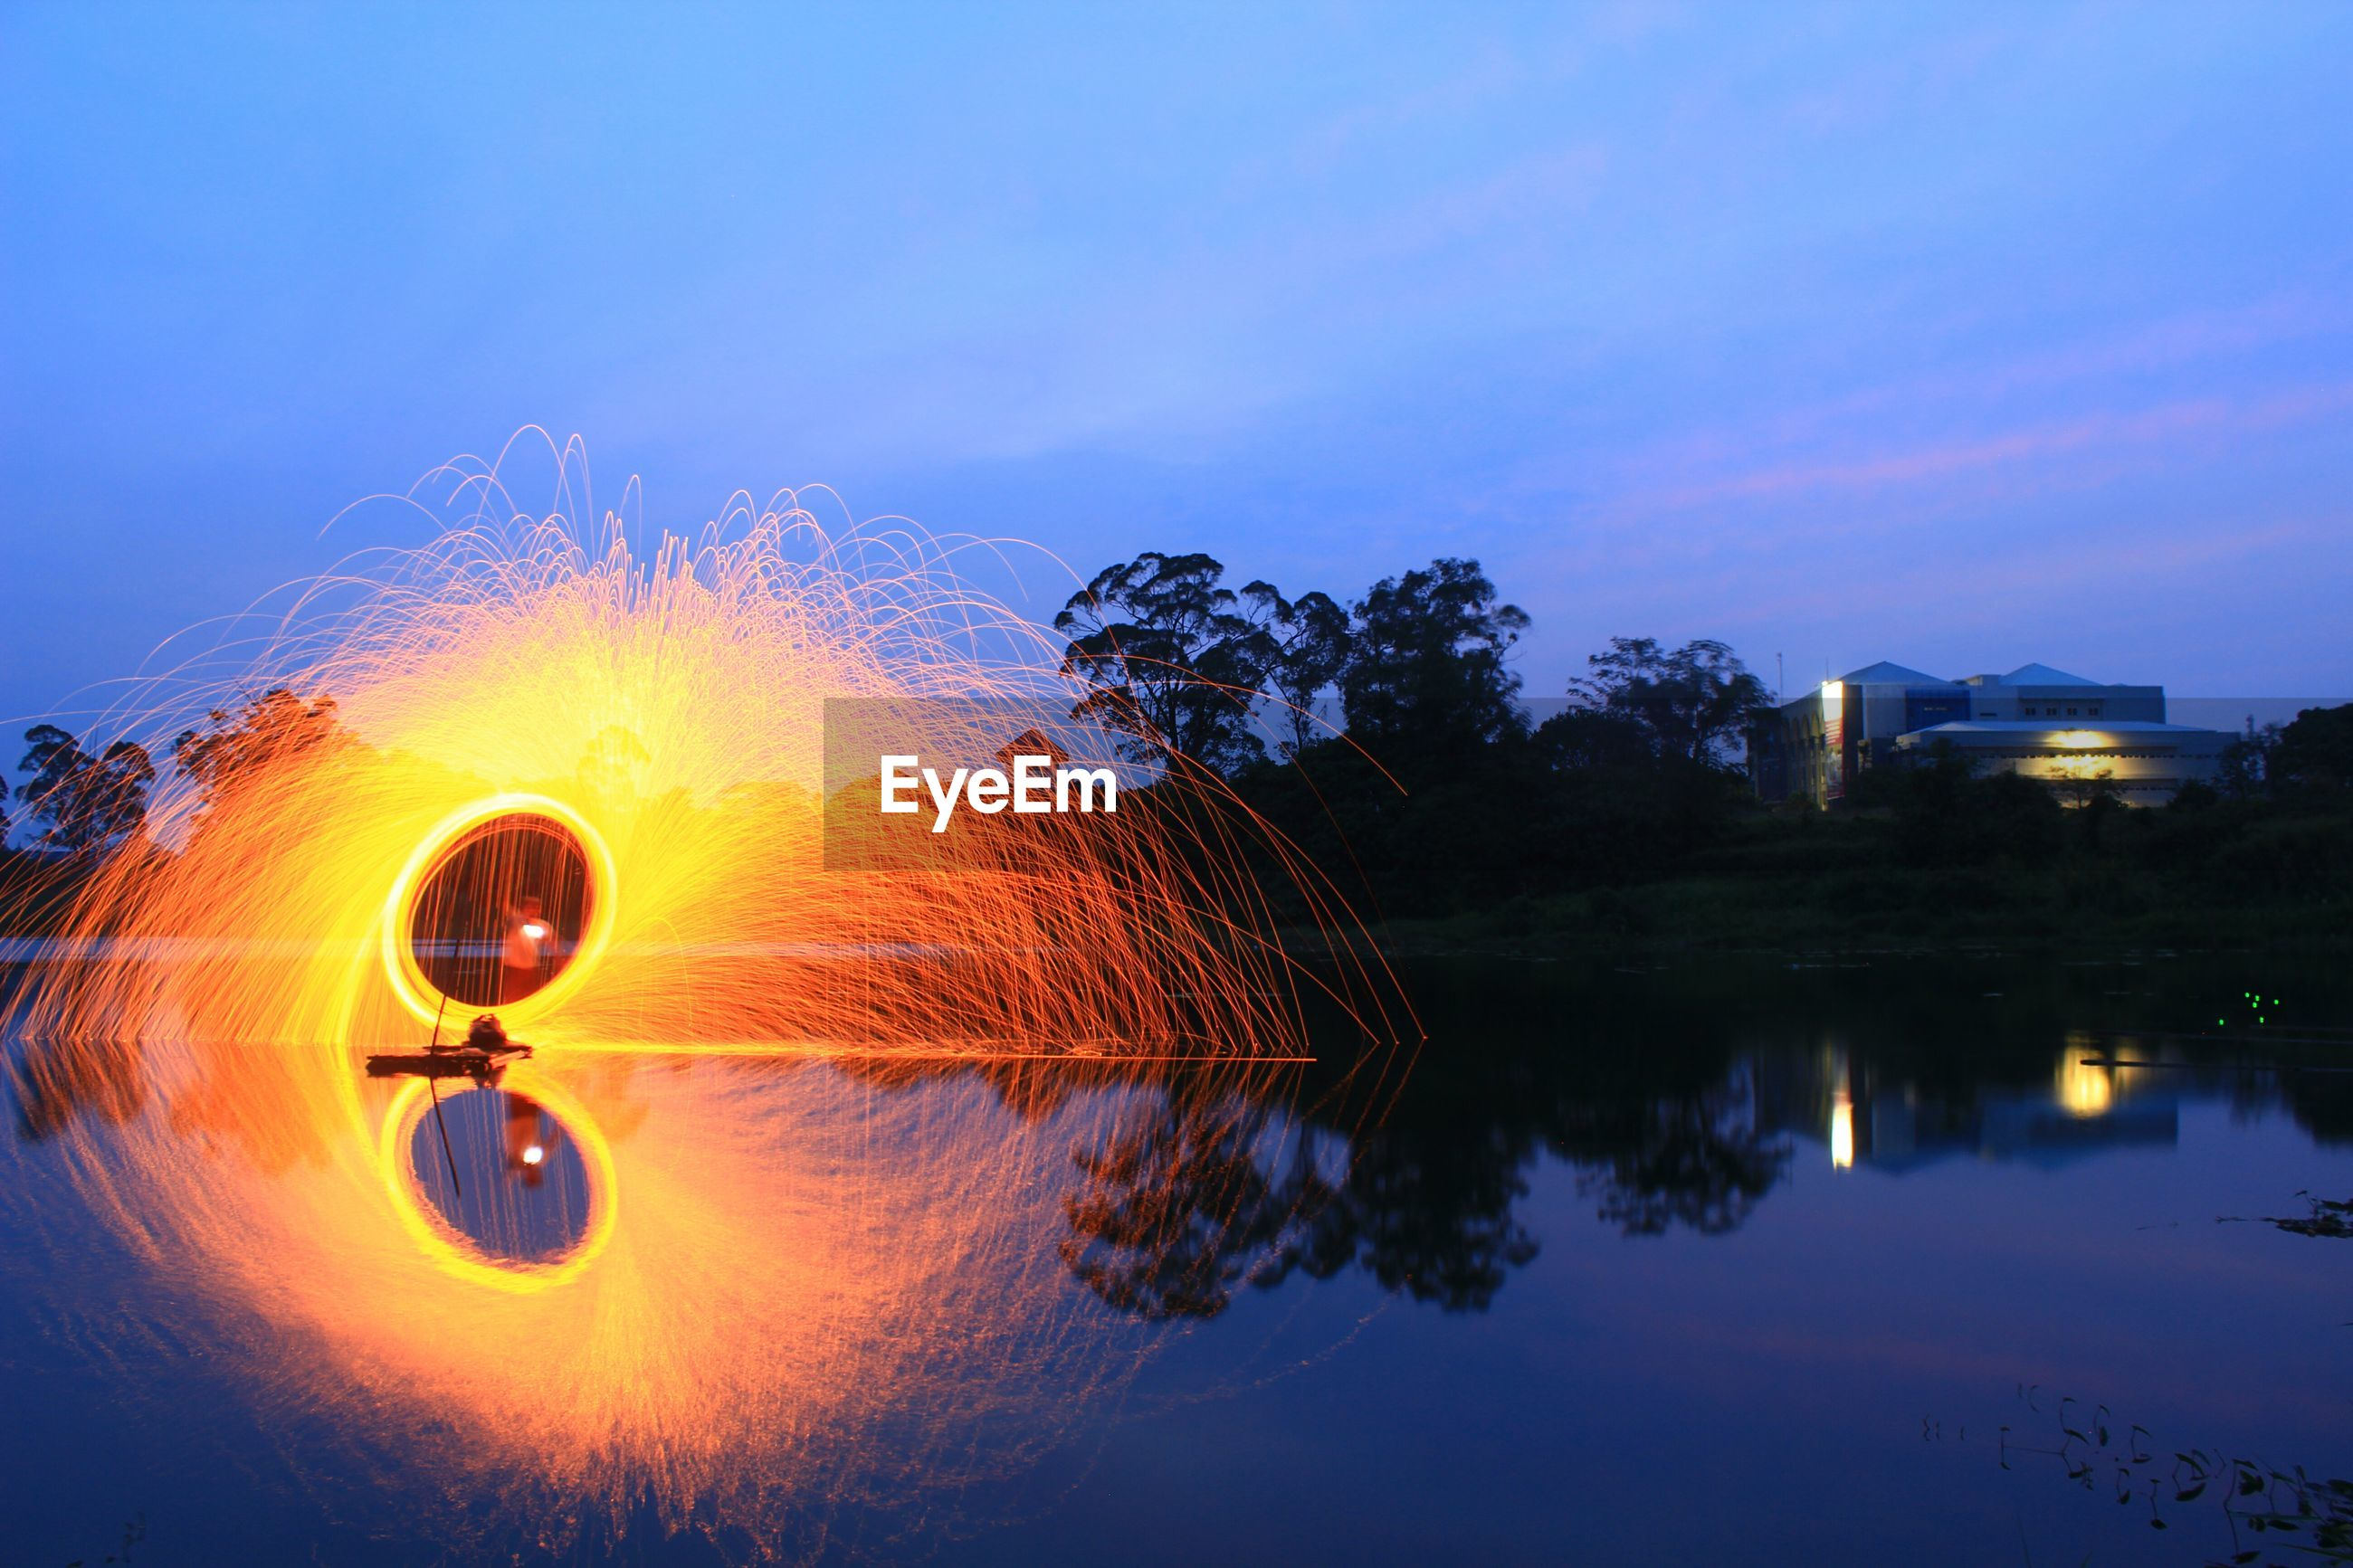 Reflection of illuminated trees on water at sunset